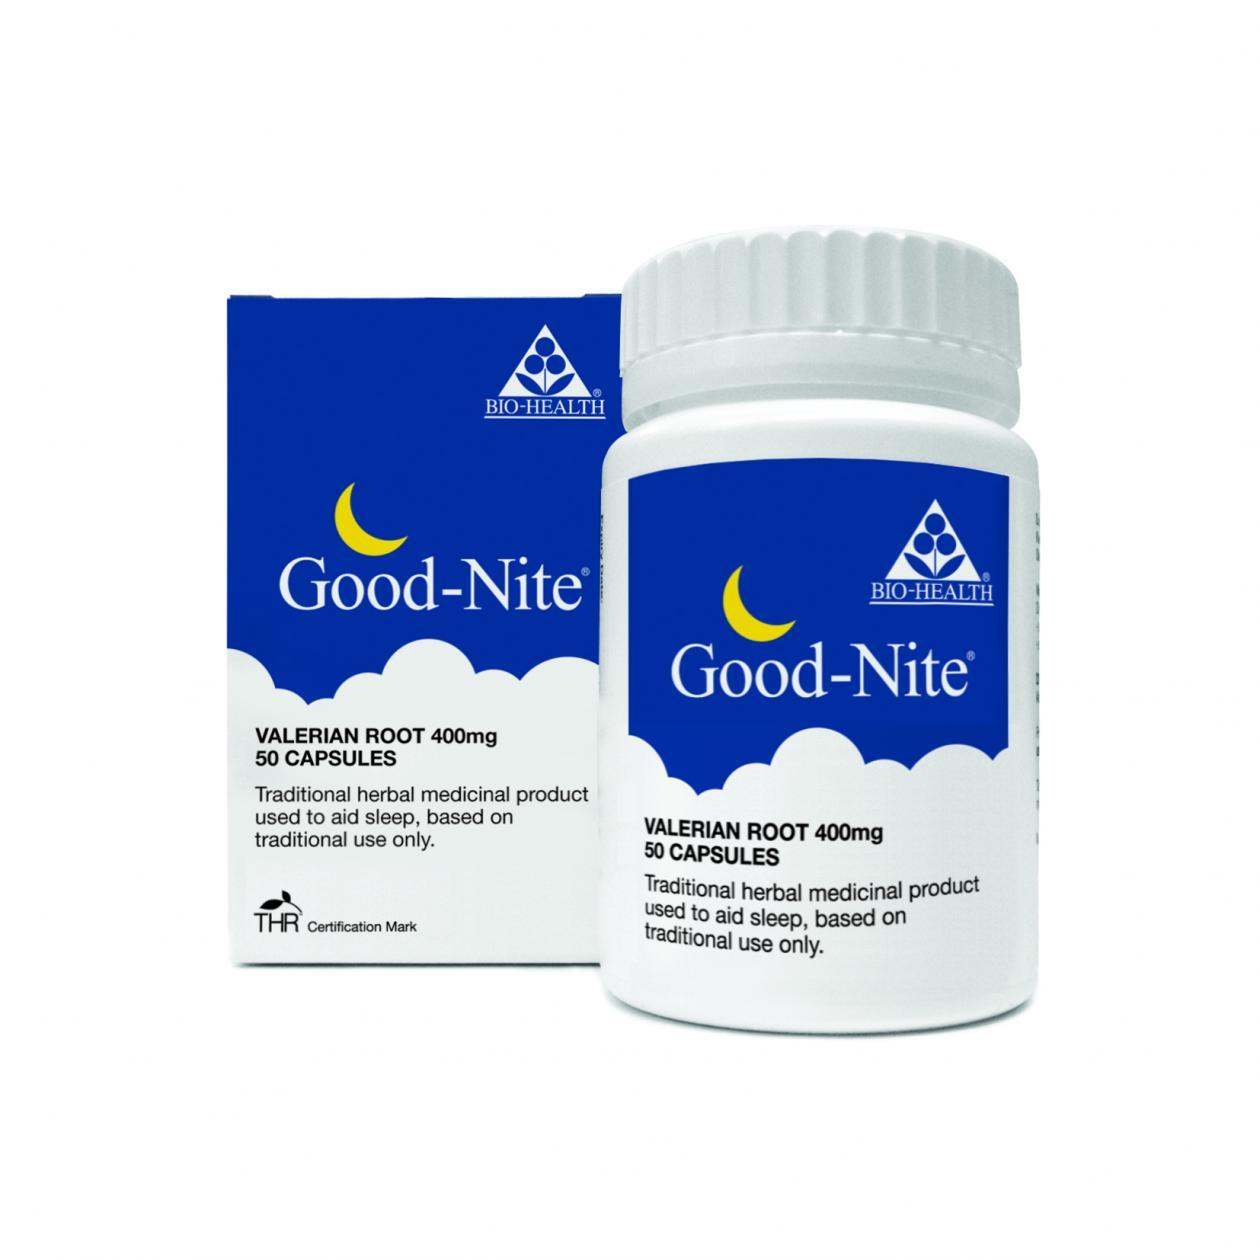 Good-Nite 50's